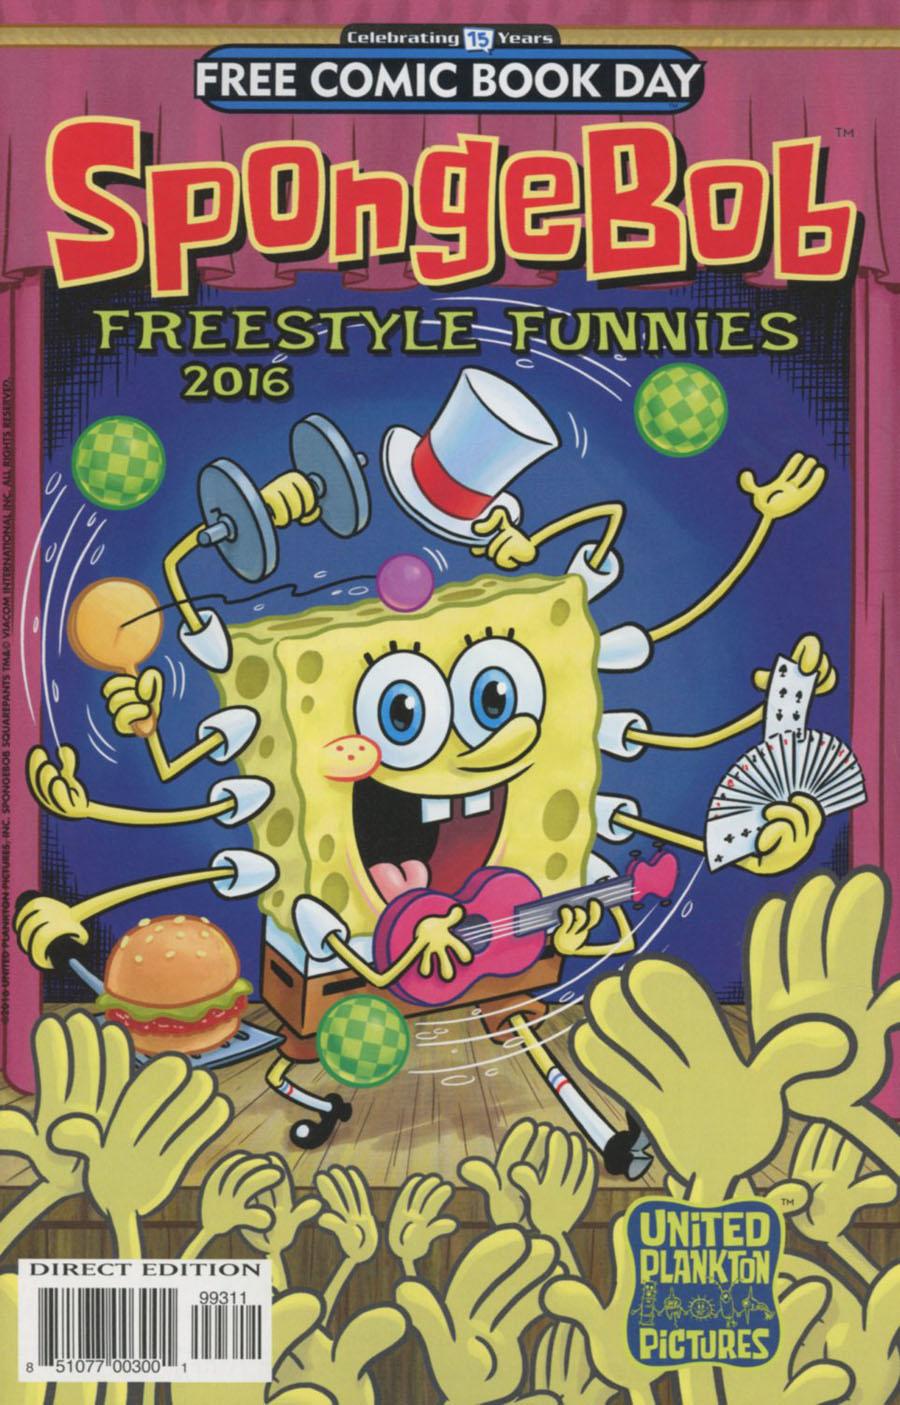 SpongeBob Freestyle Funnies FCBD 2016